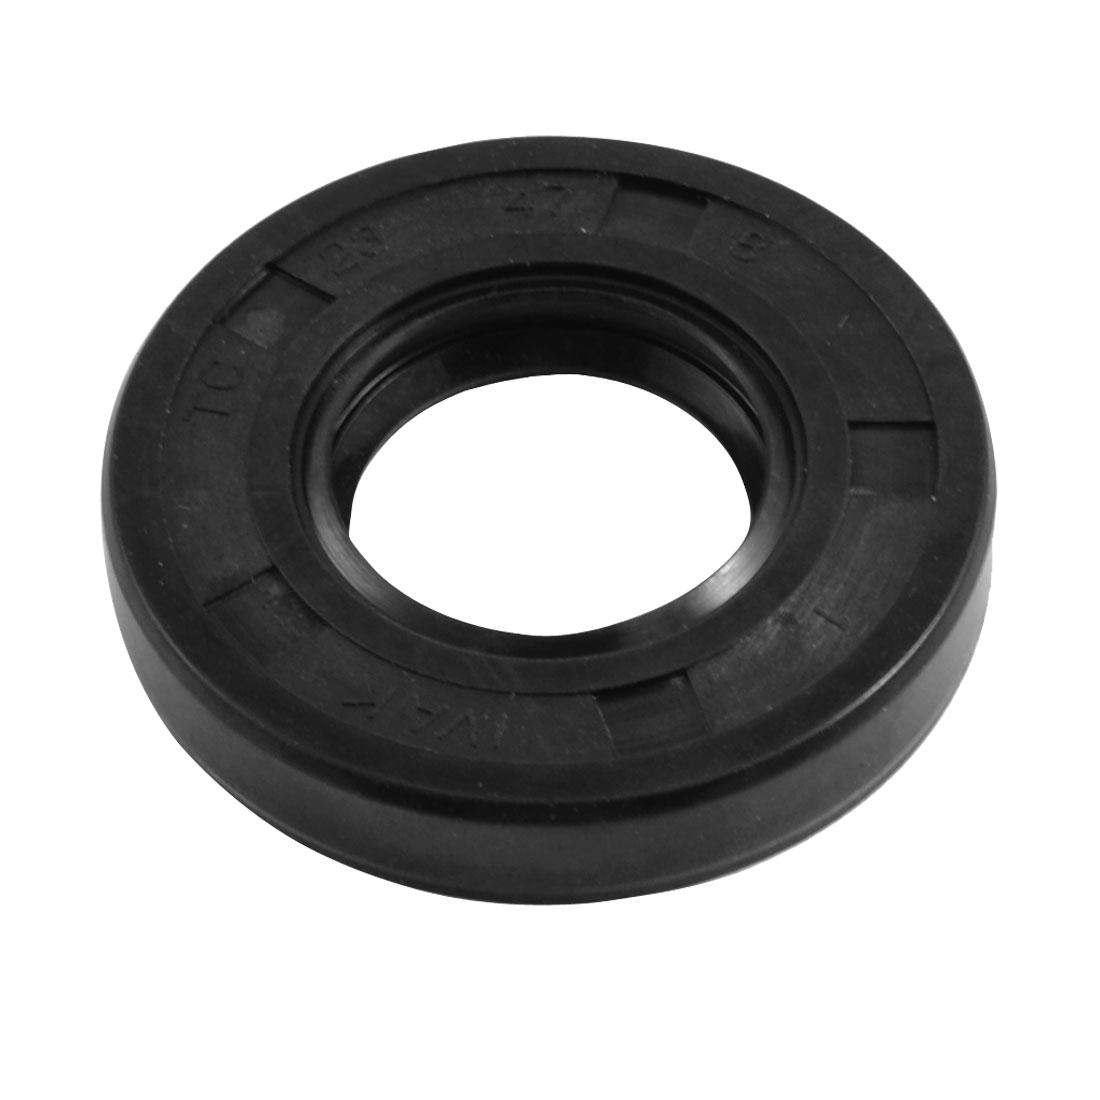 23mm x 47mm x 8mm Metric NBR Double Lipped Oil Shaft Seal TC